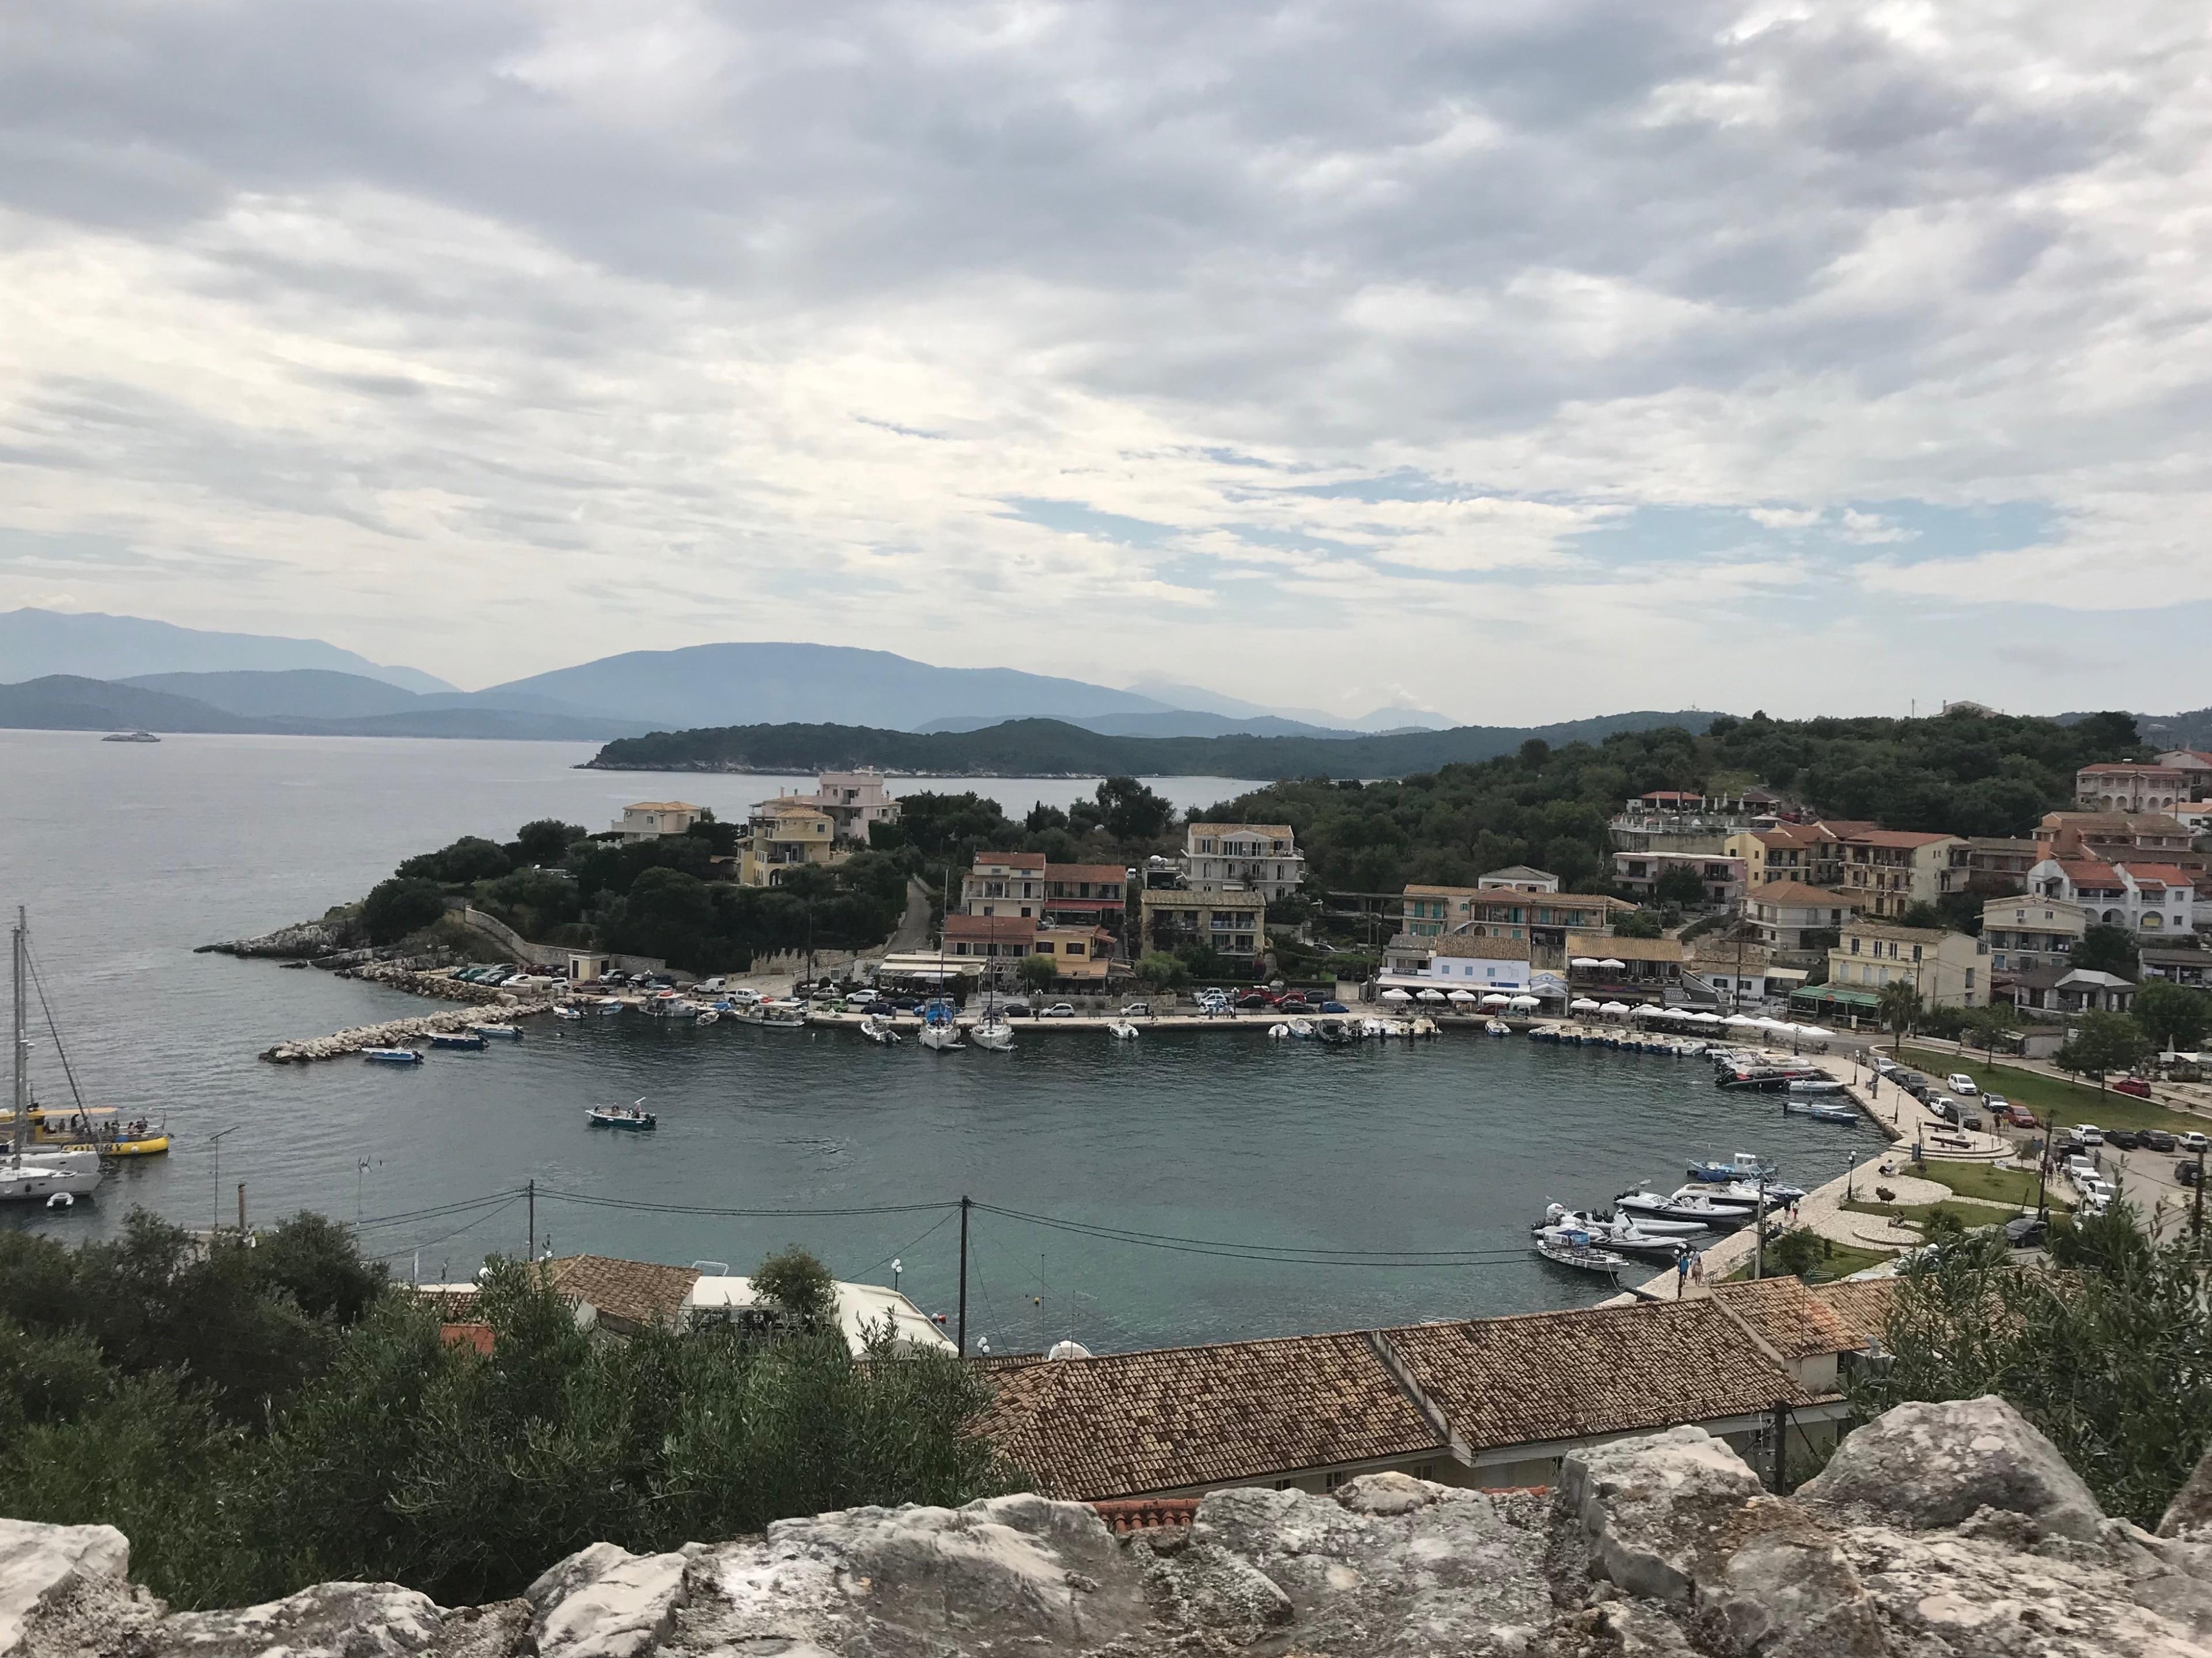 Kassiopi, Corfu, Ionian Islands Region, Greece